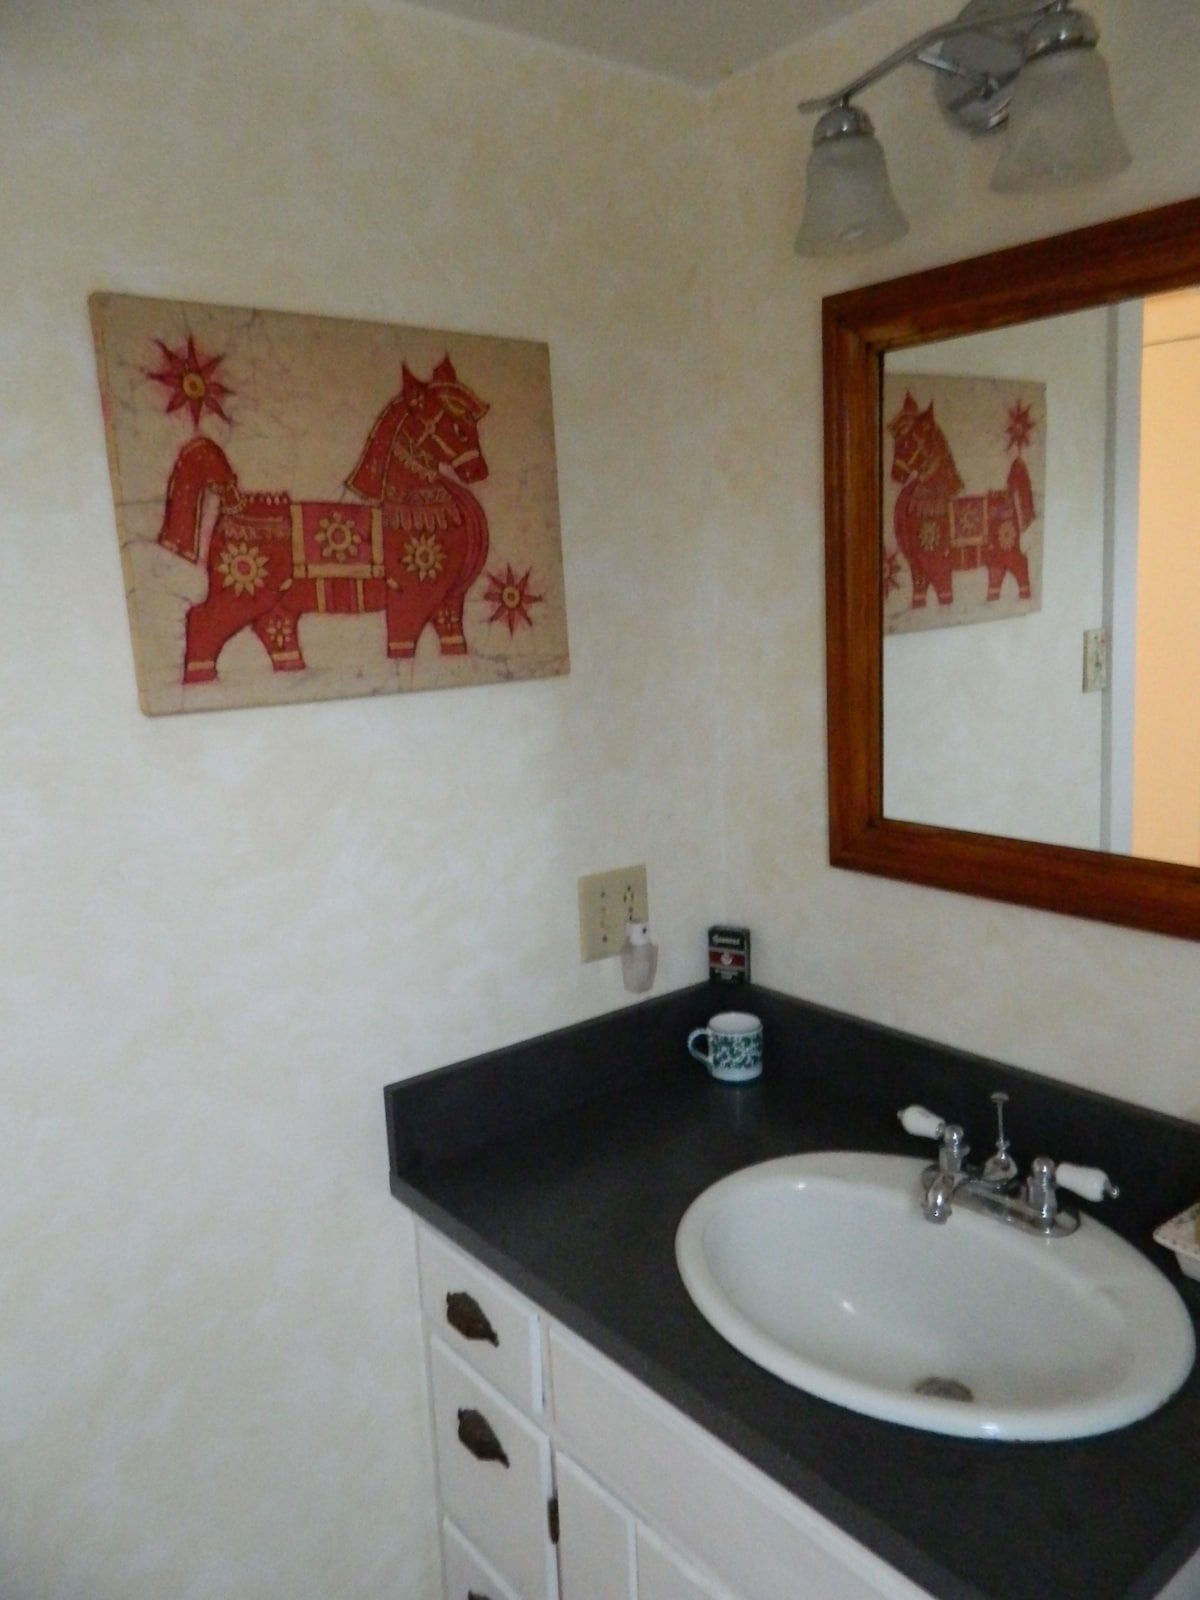 Nice tiled shower, but no tub.